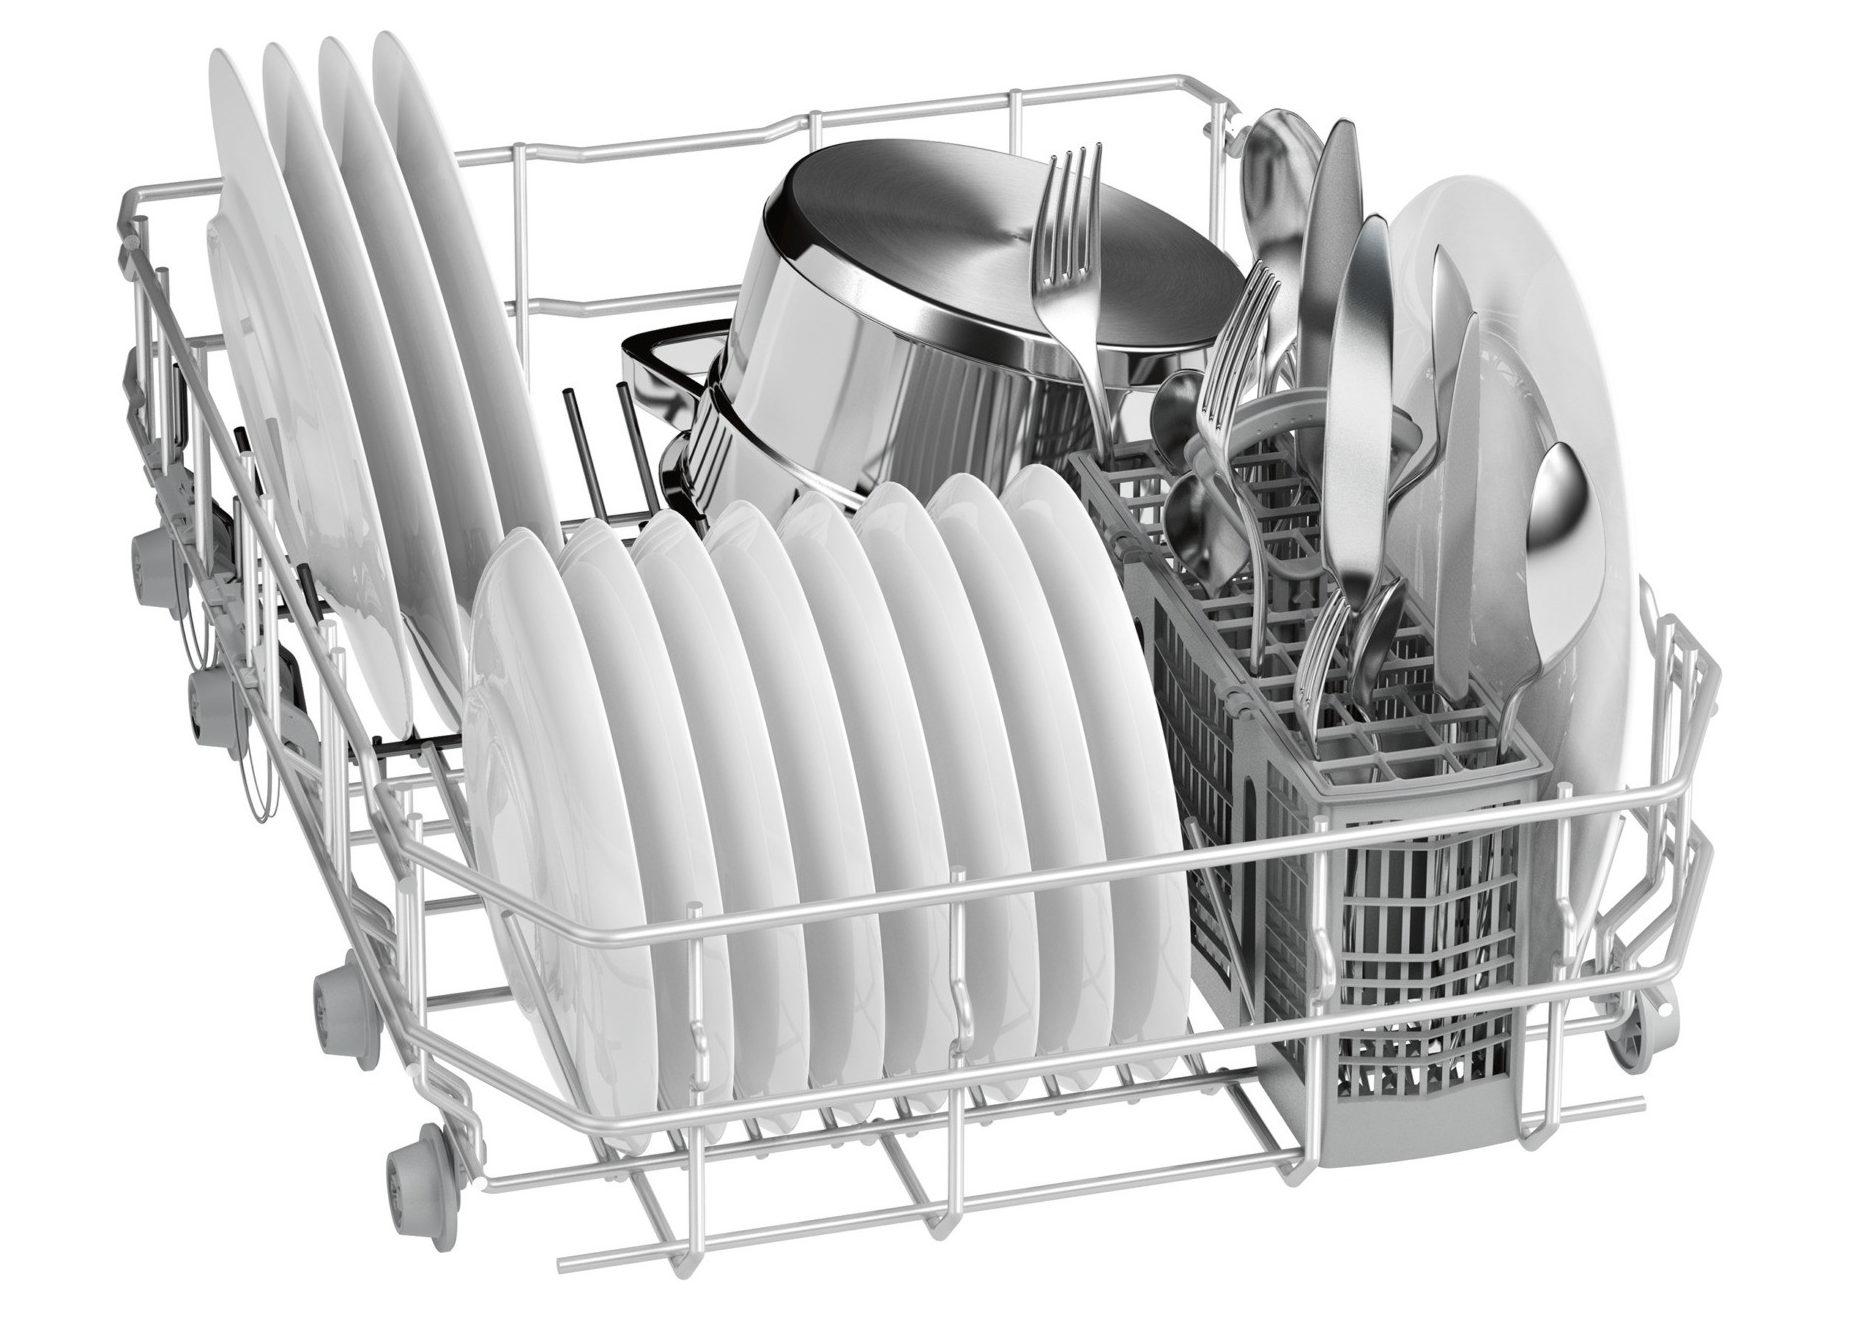 Нижняя корзина посудомойки Сименс SR64E005RU